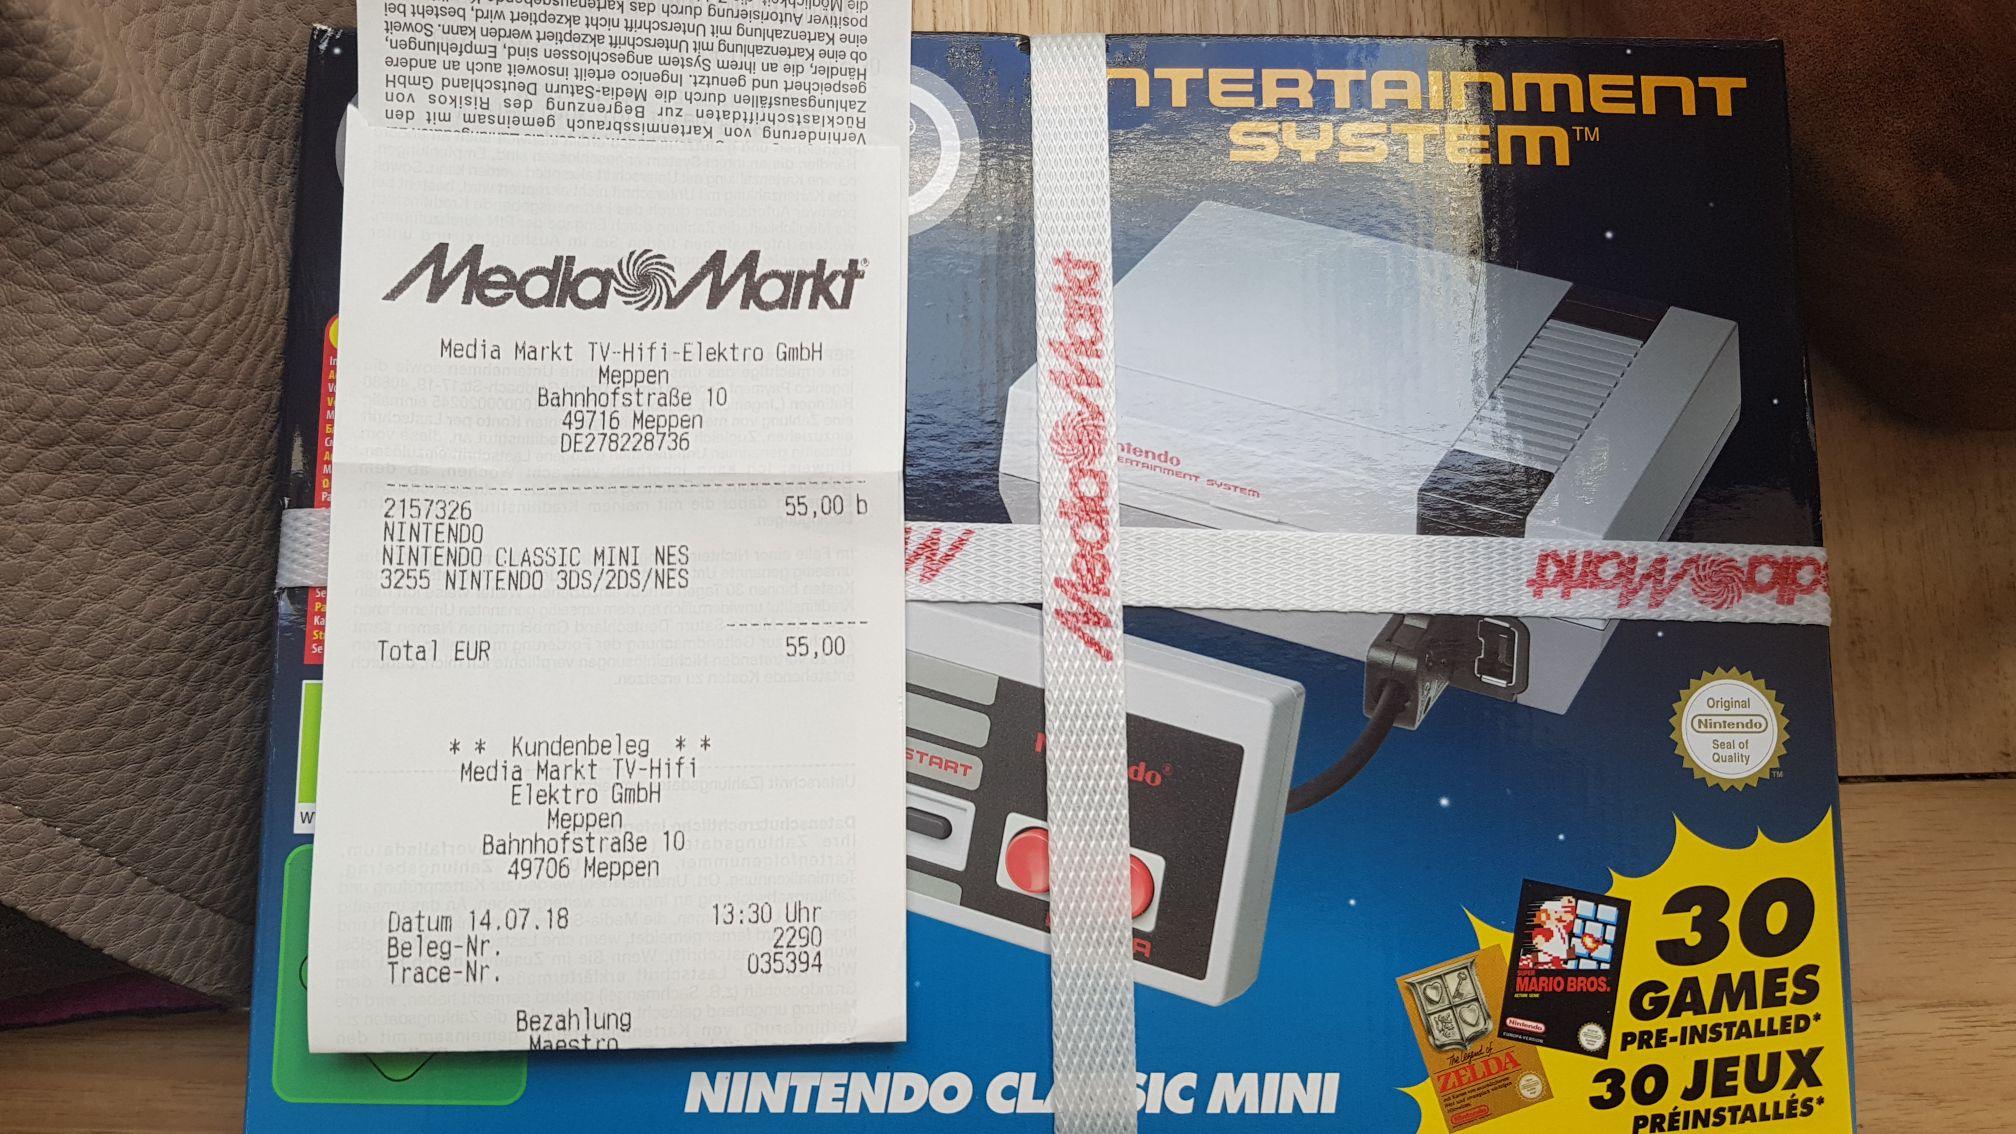 Grensdeal Nintendo classic mini